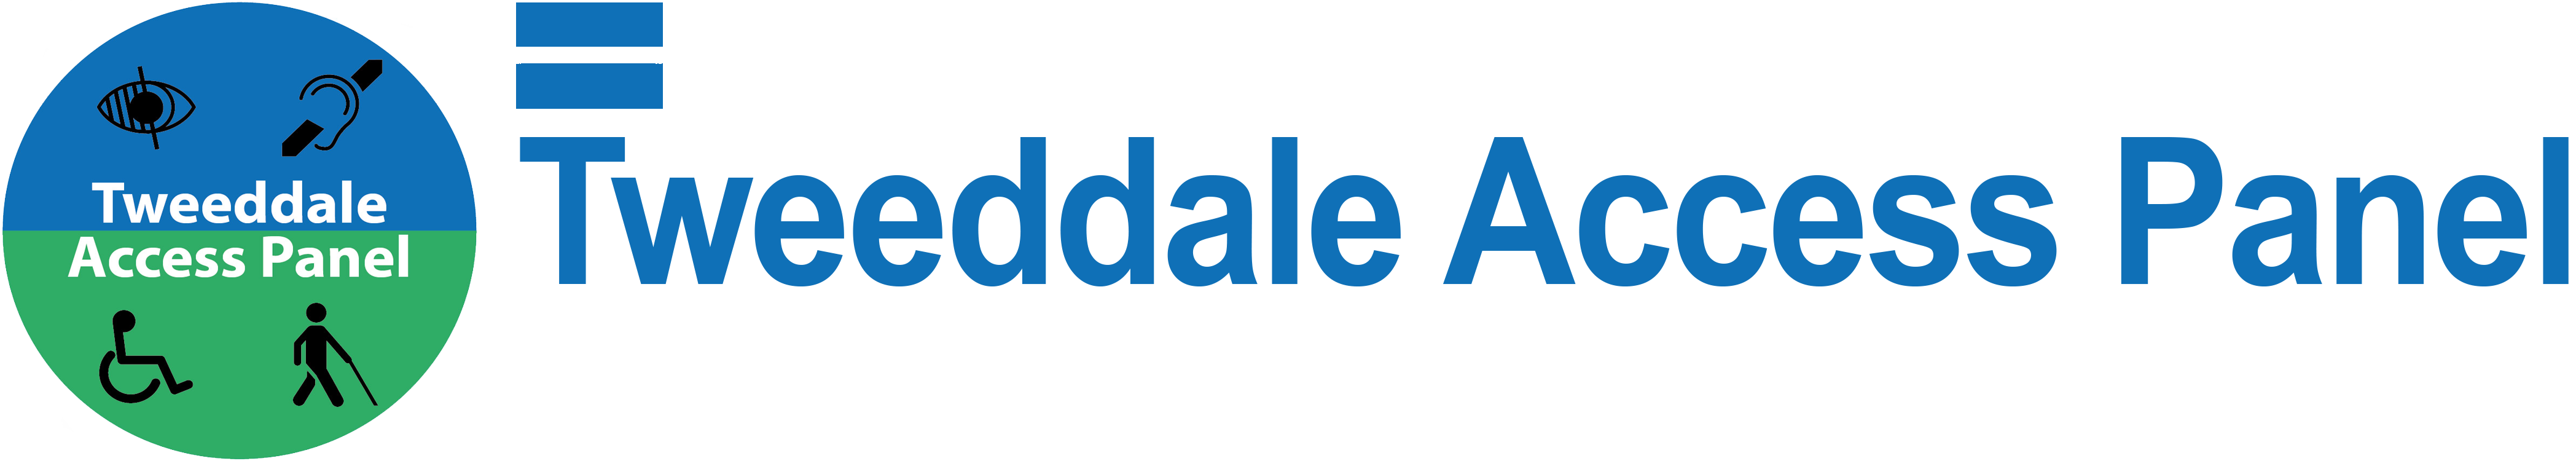 Tweeddale Access Panel